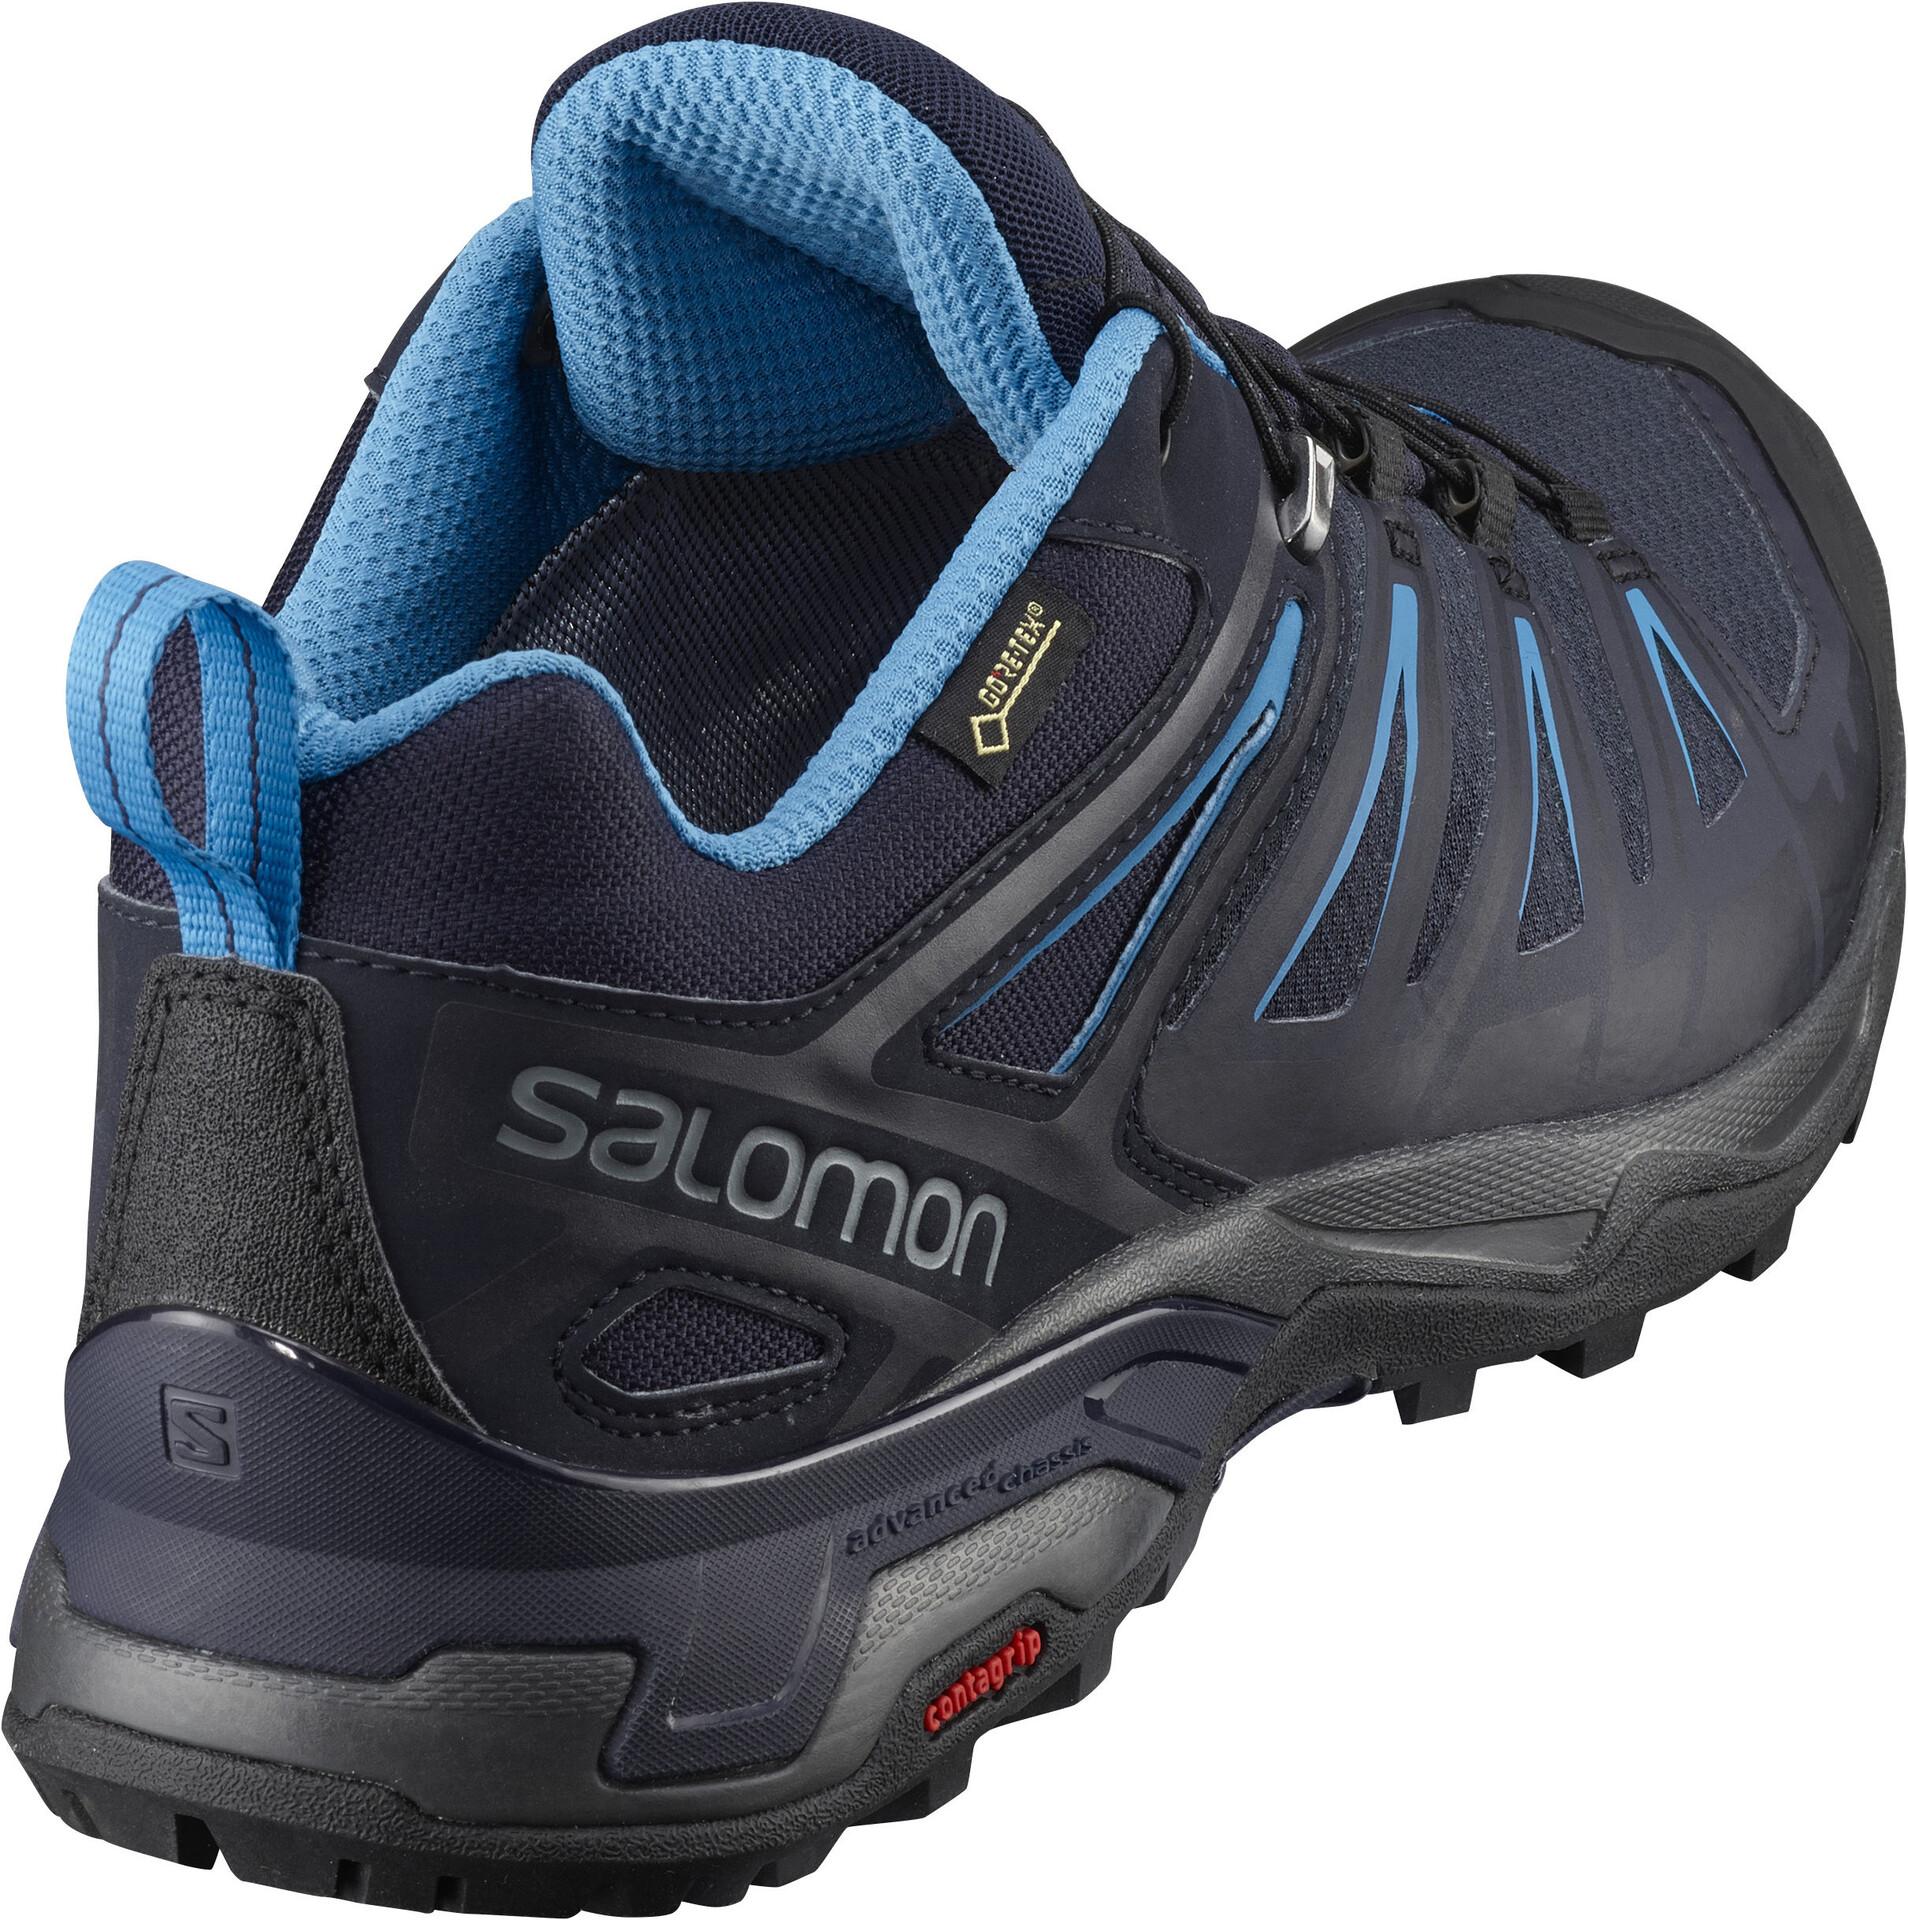 X Gtx Shoes Surf Salomon Ultra Graphitenight 3 Men Skyhawaiian oCerdxB